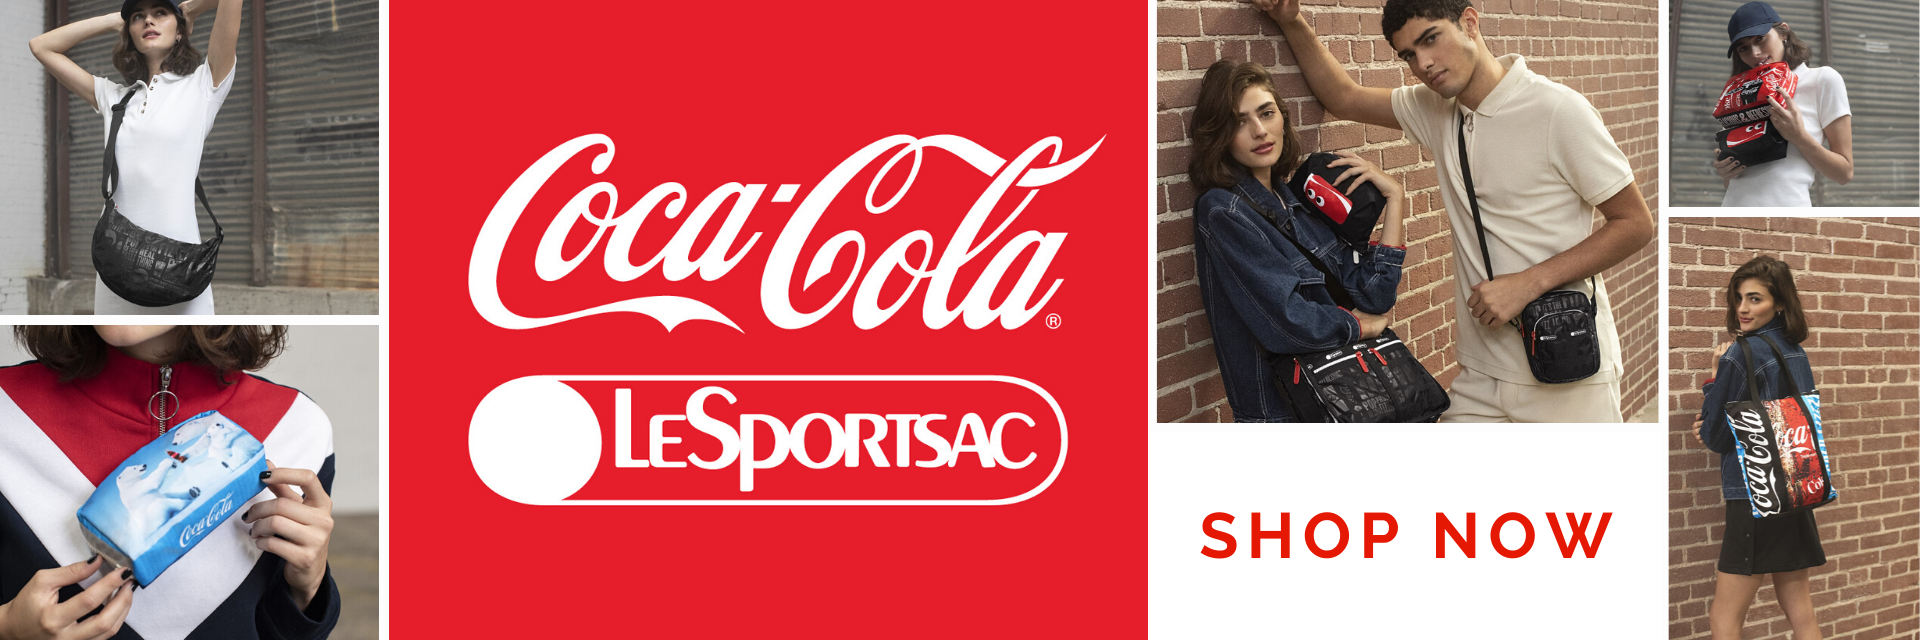 lesportsac x coca cola 可口可樂聯名系列